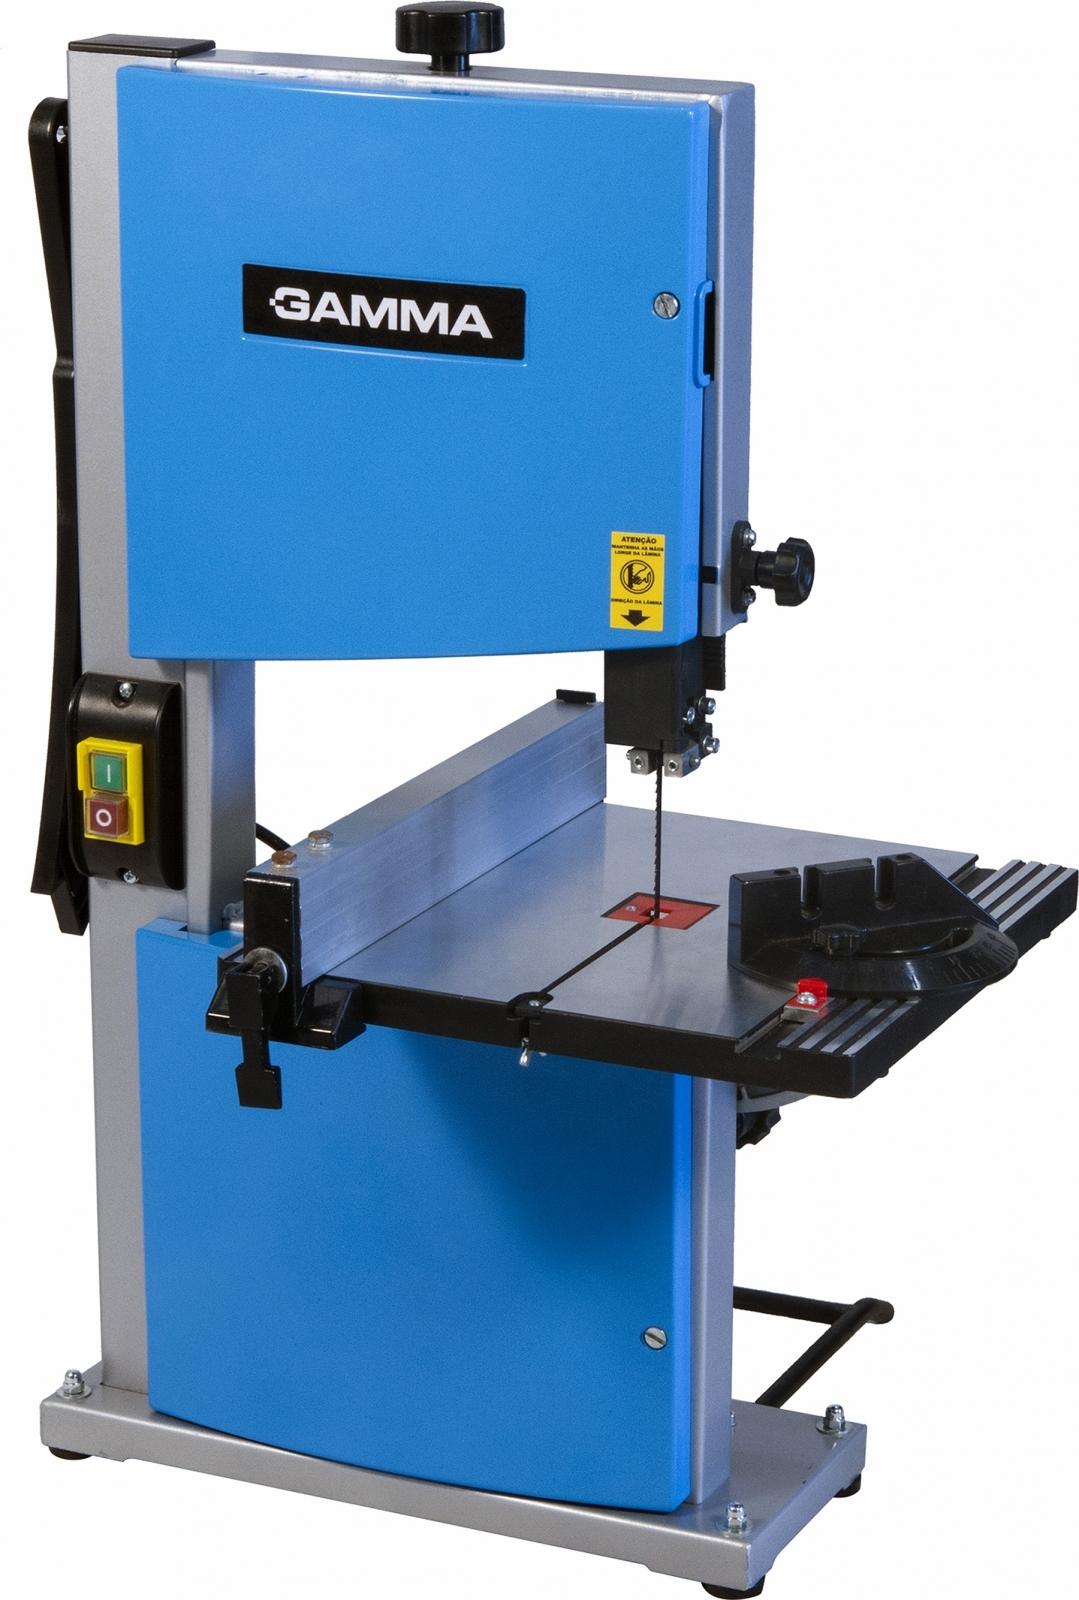 Serra Fita De Bancada Para Madeira Gamma G122 350 Watts - Ferramentas MEP